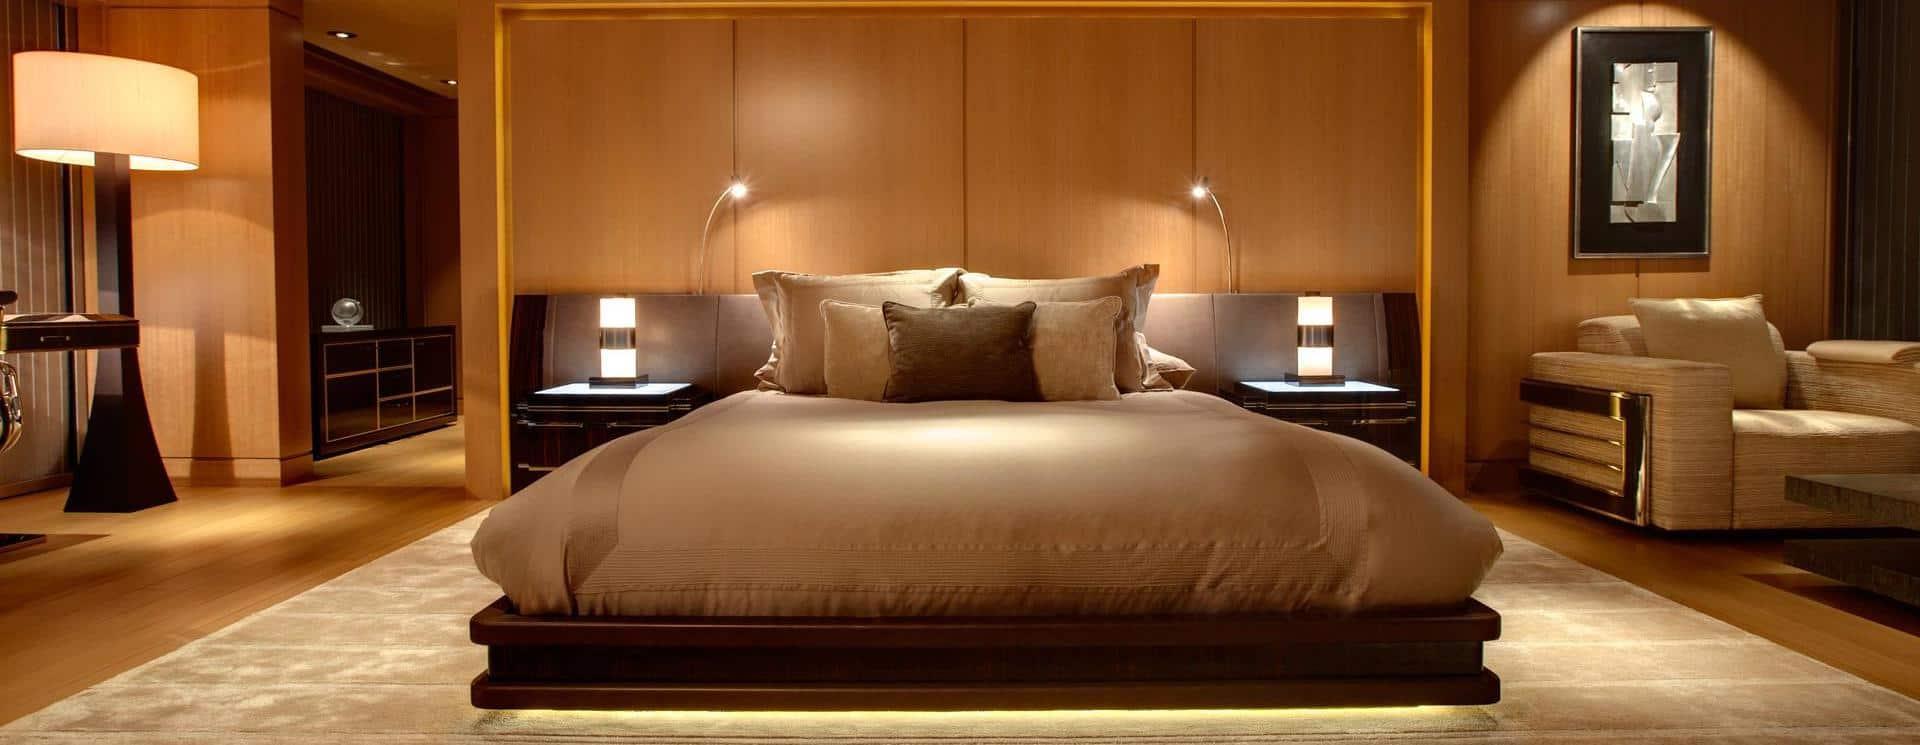 dizayn-spalni-7